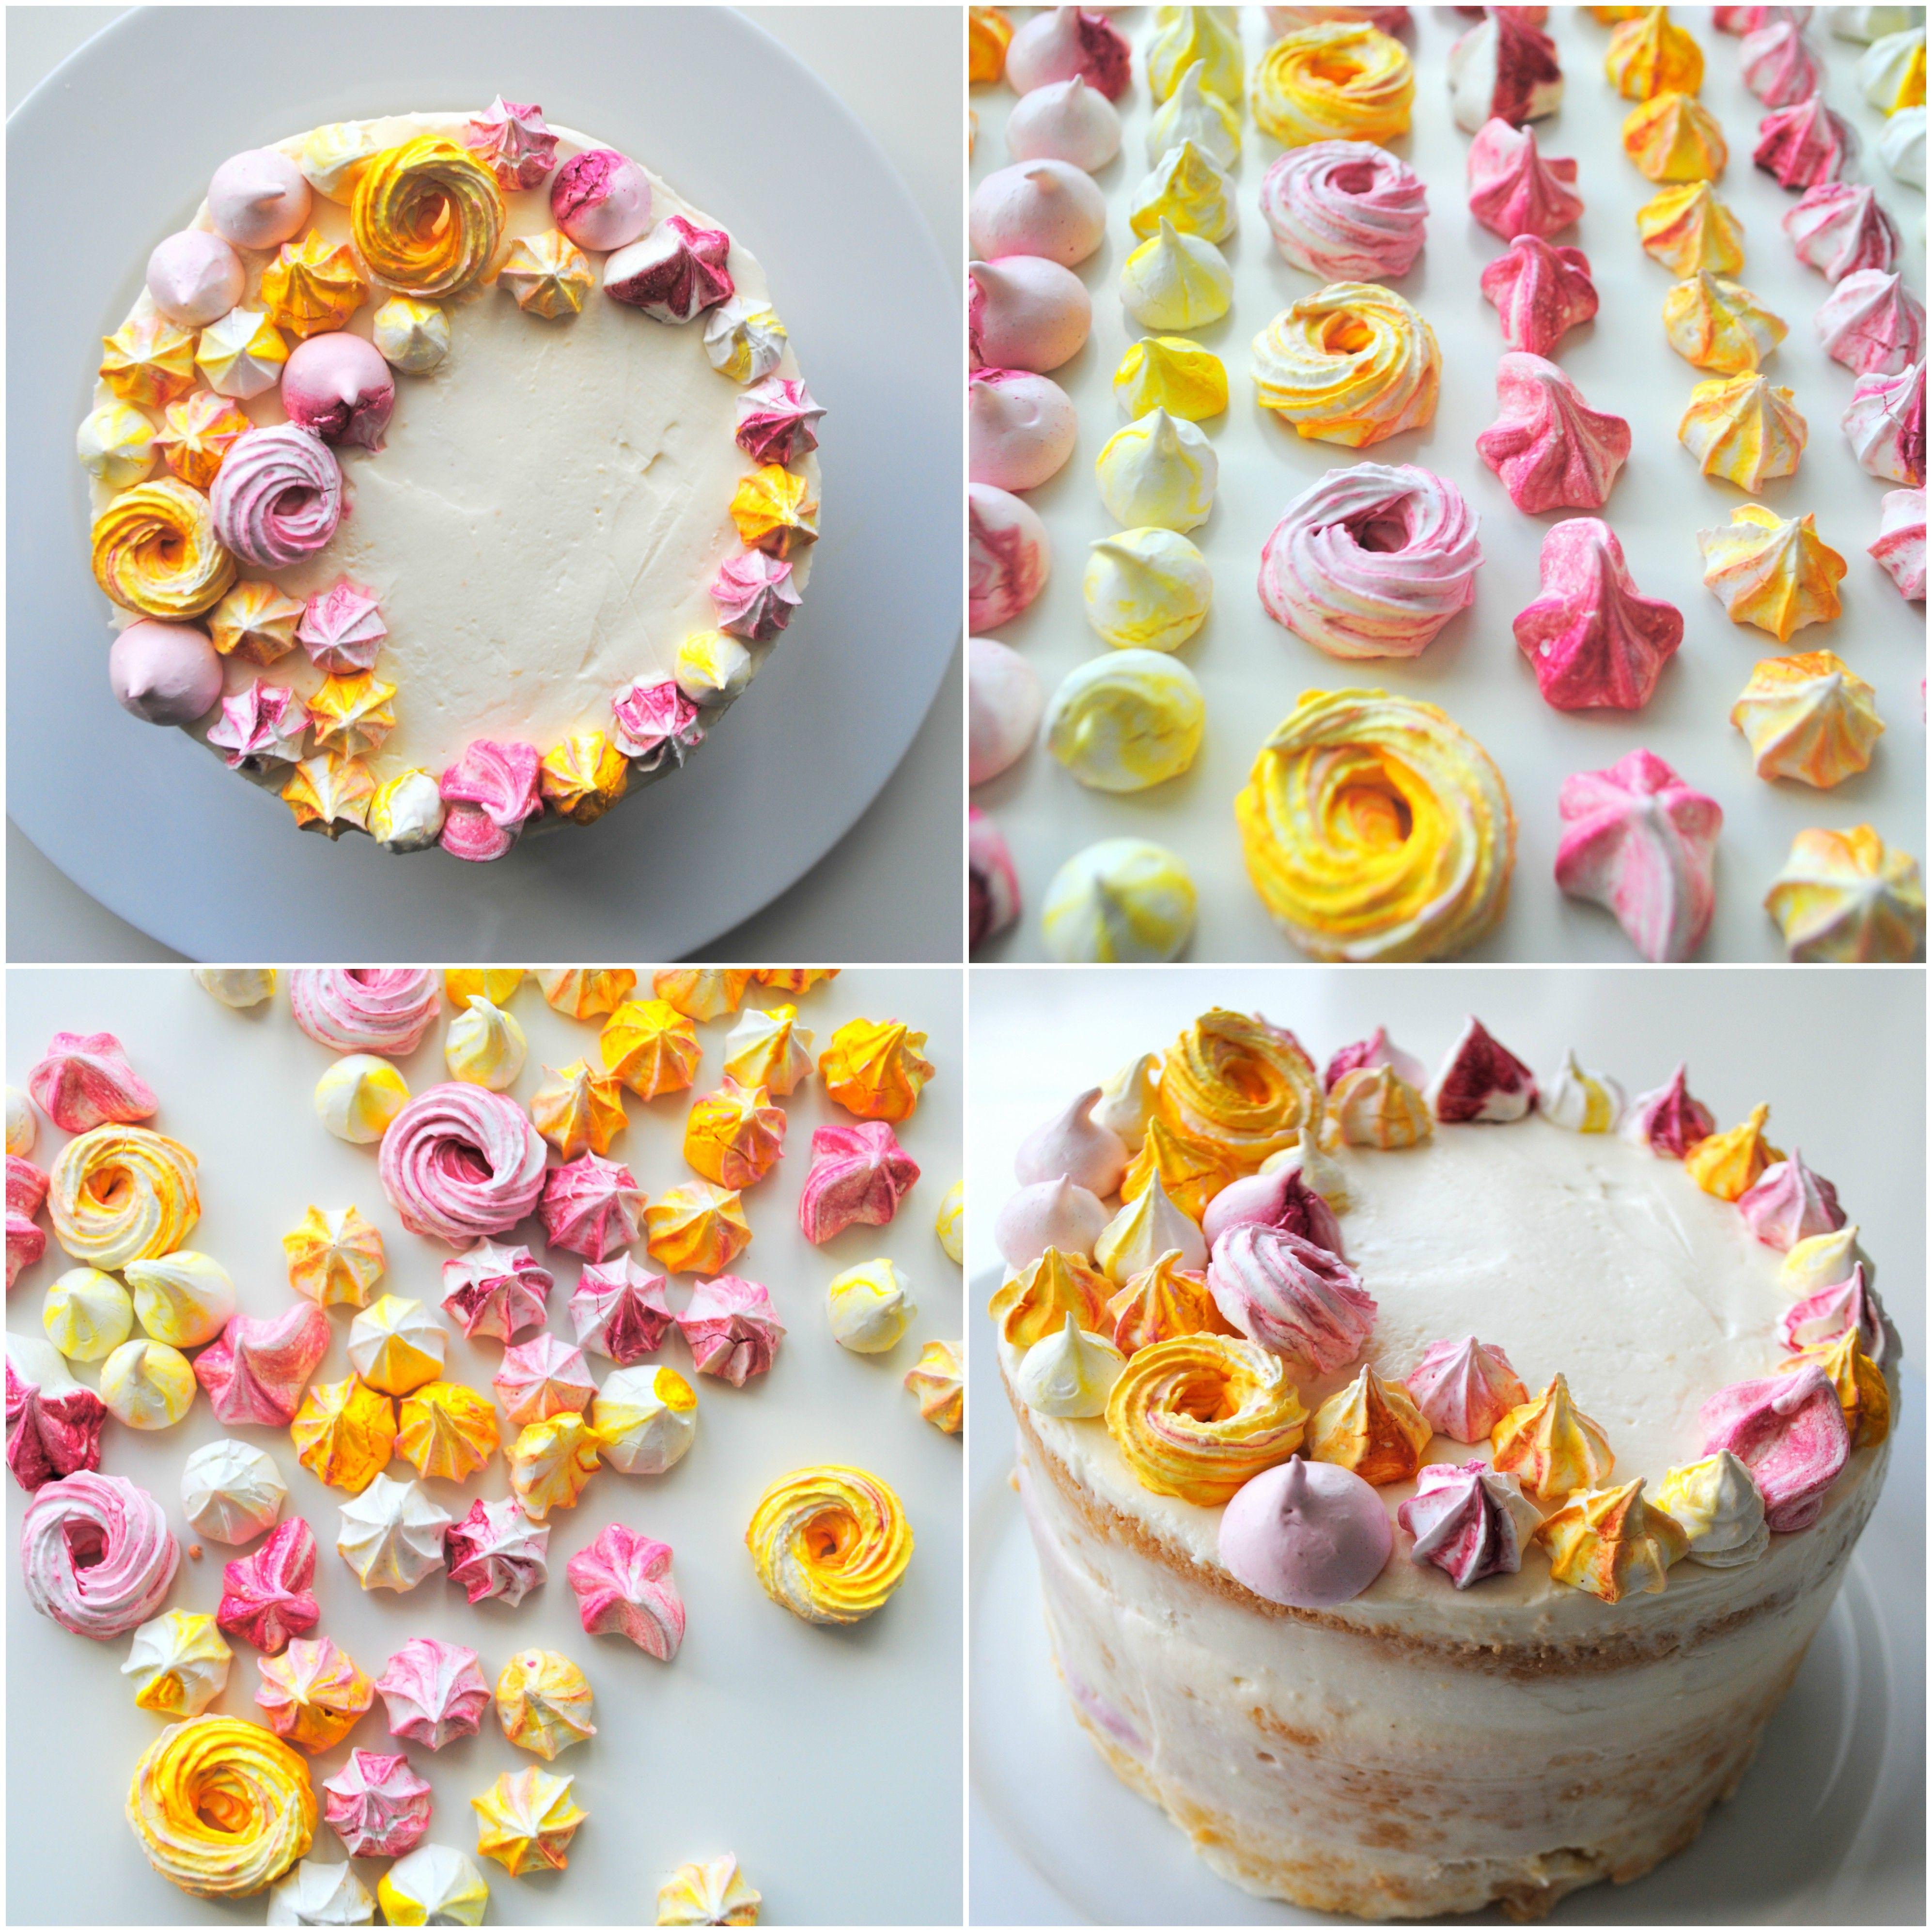 Make Variations Of Meringue Kisses For Cake Decoration